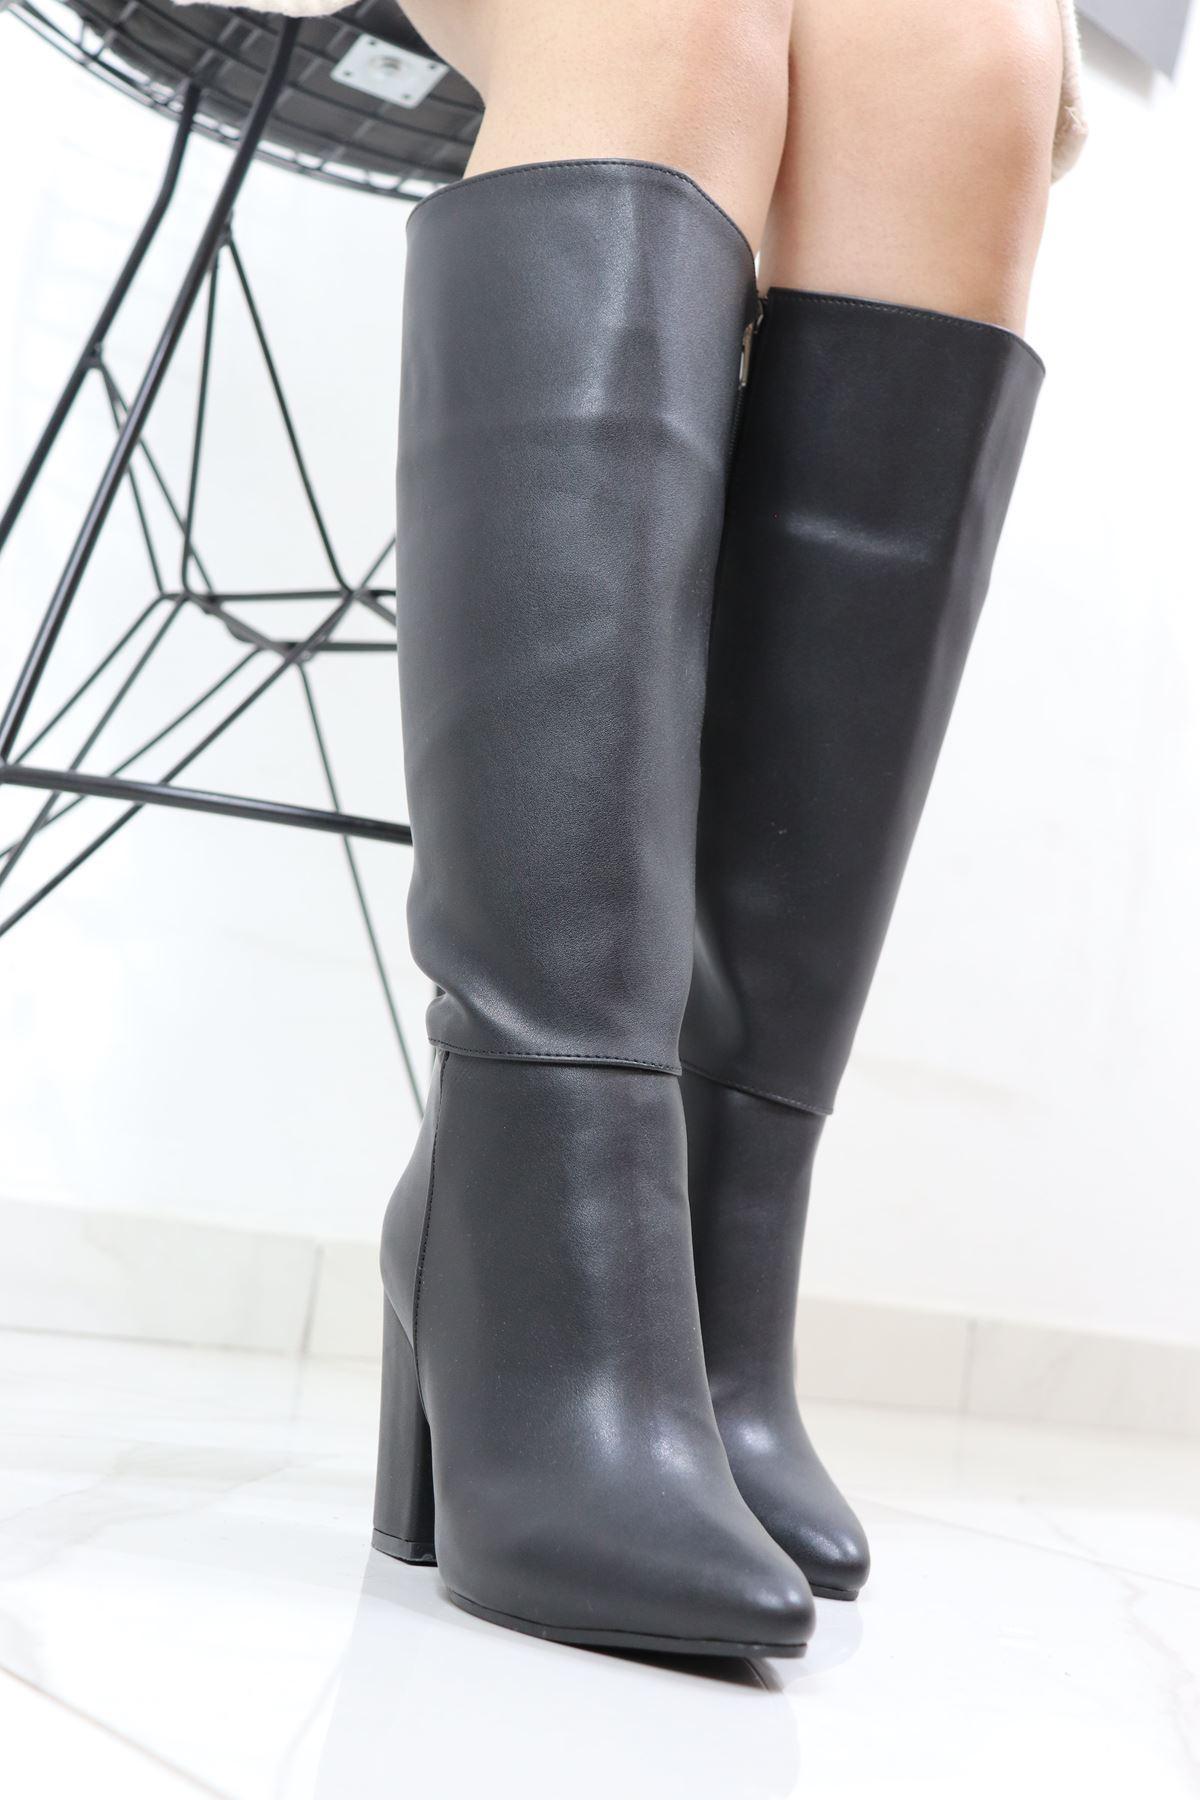 Trendayakkabi - Siyah Topuklu Çizme